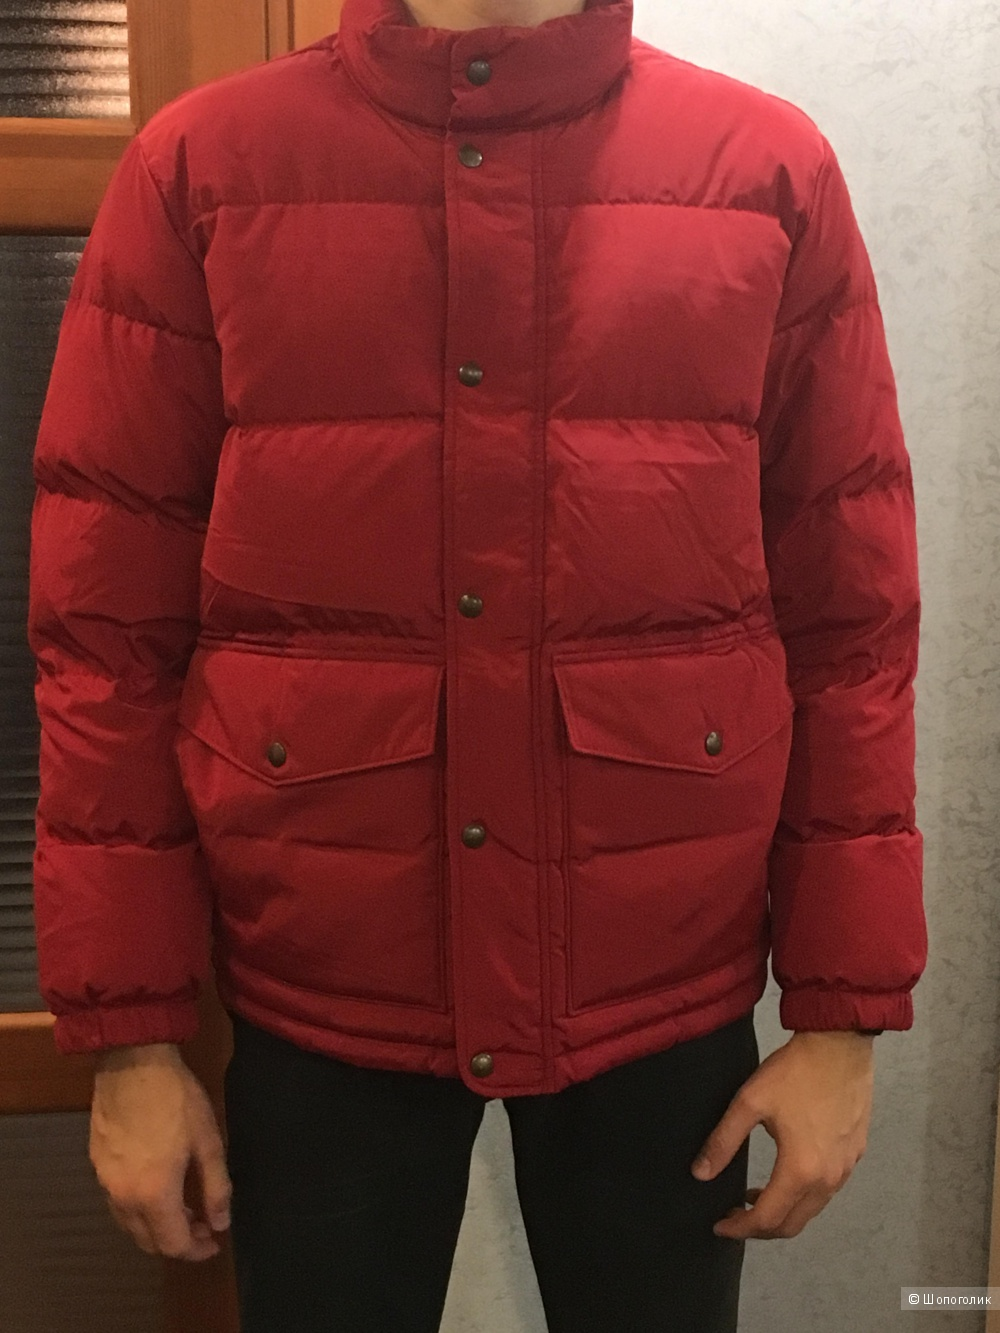 Мужской пуховик Men's 600 Down Jacket, размер М. На рос. 48-50